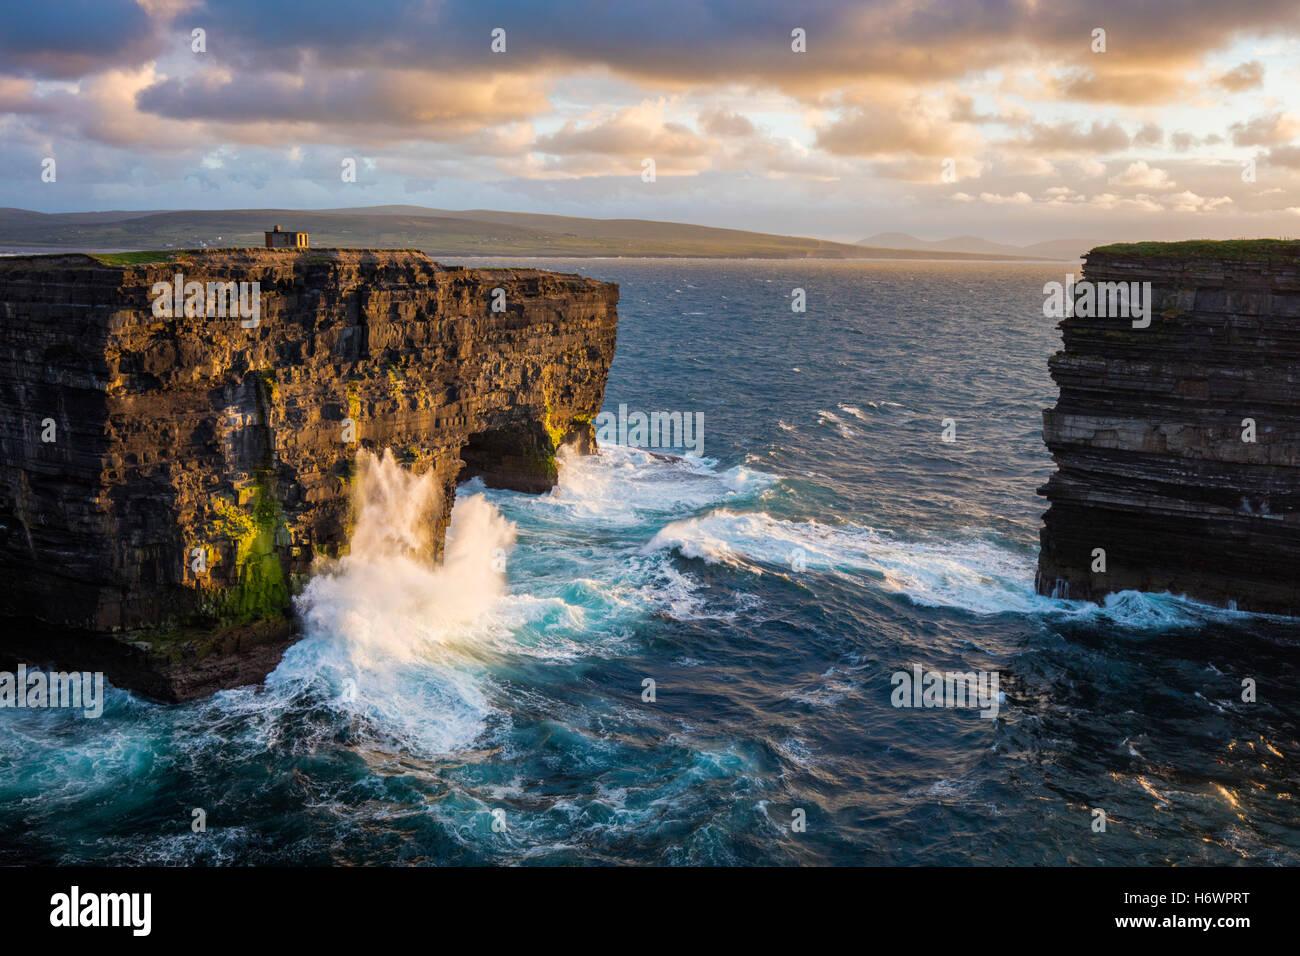 Evening at Dun Briste, Downpatrick Head, County Mayo, Ireland. Stock Photo